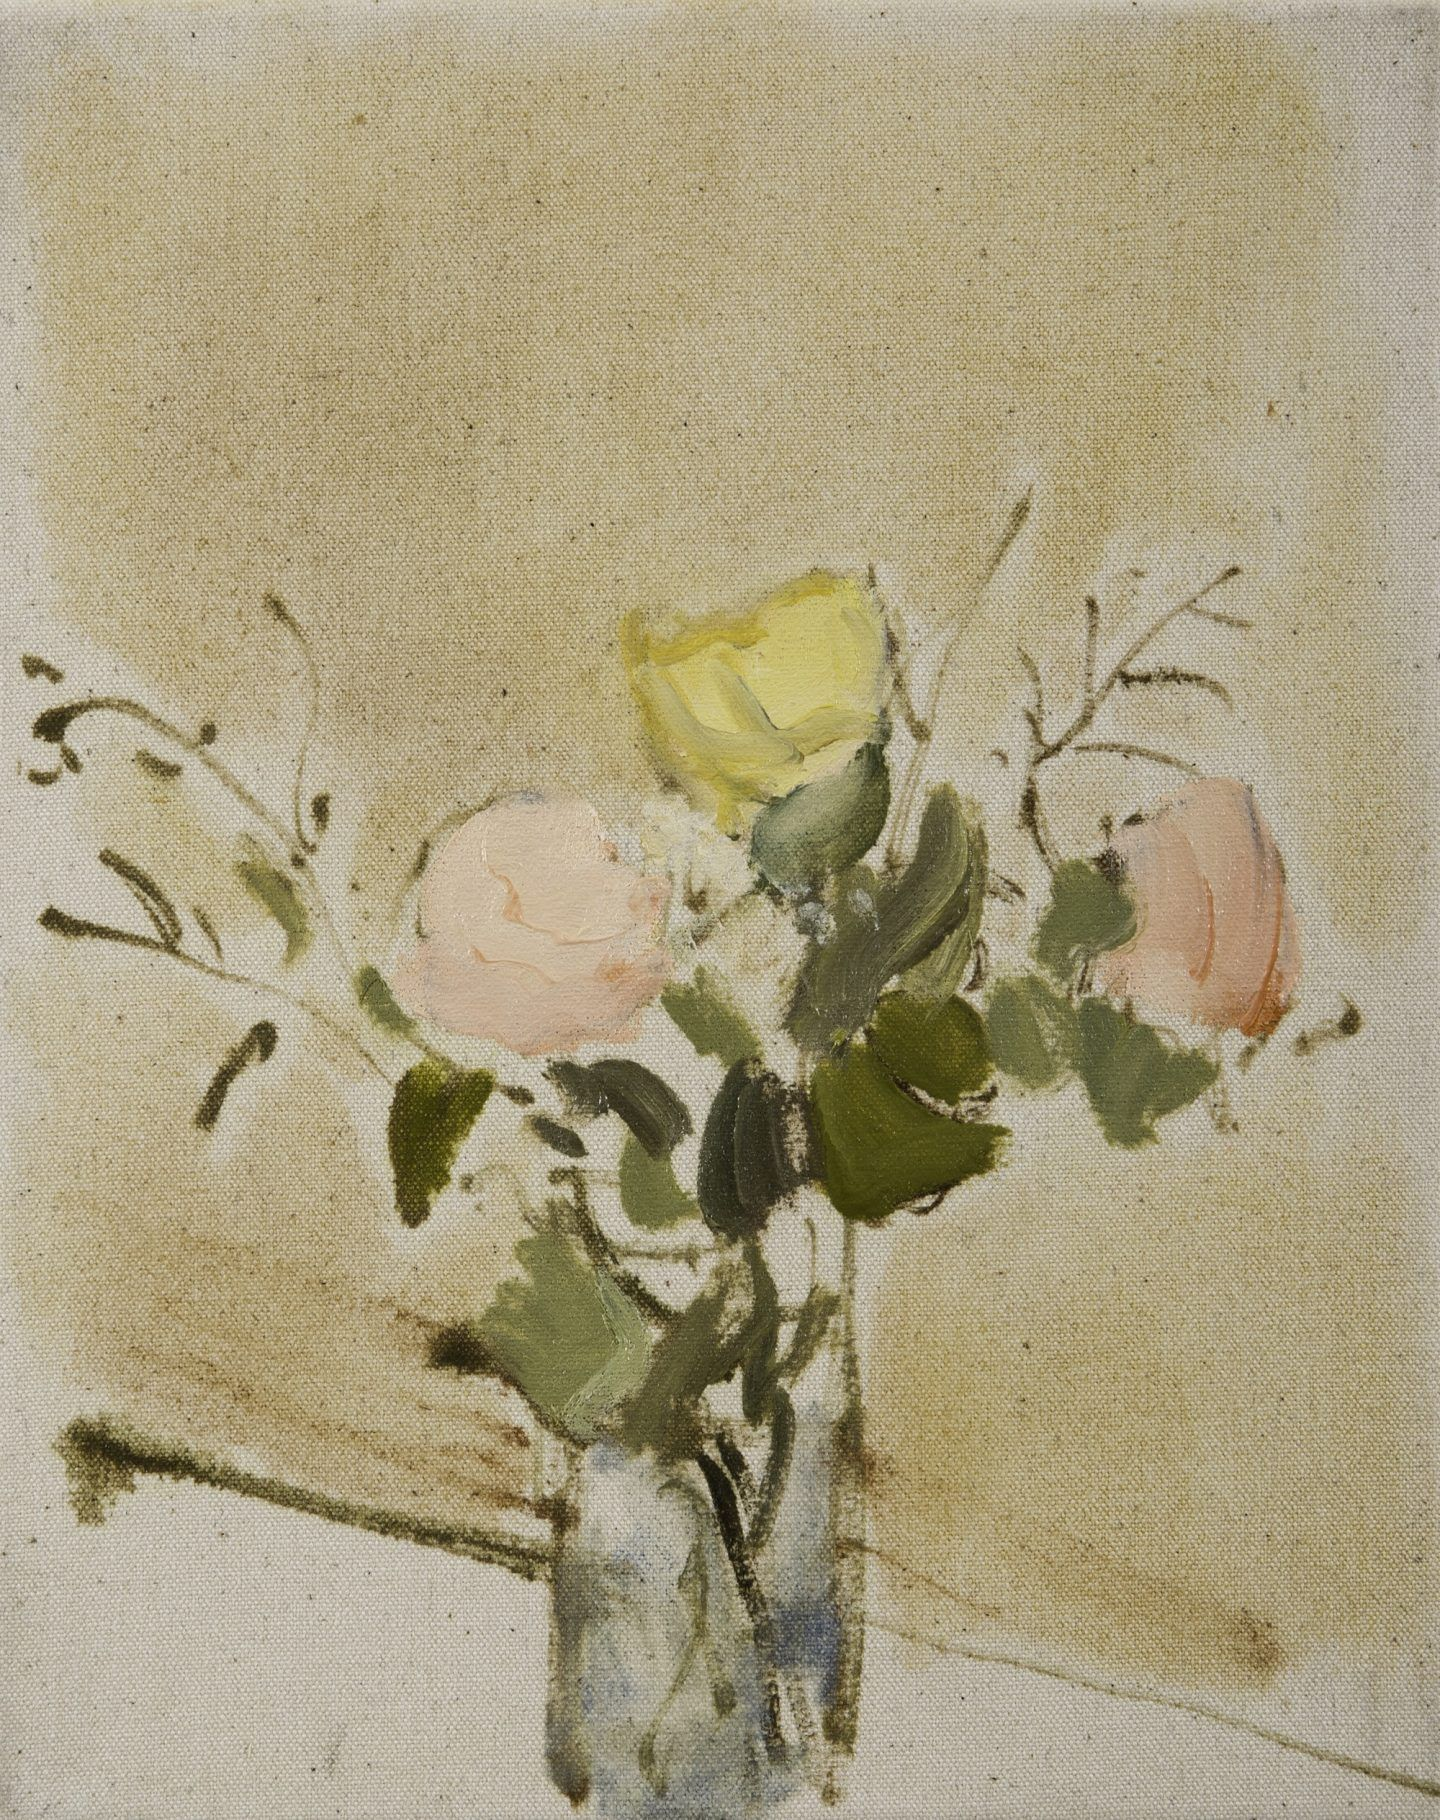 IGNANT-Art-Gideon-Rubin-10